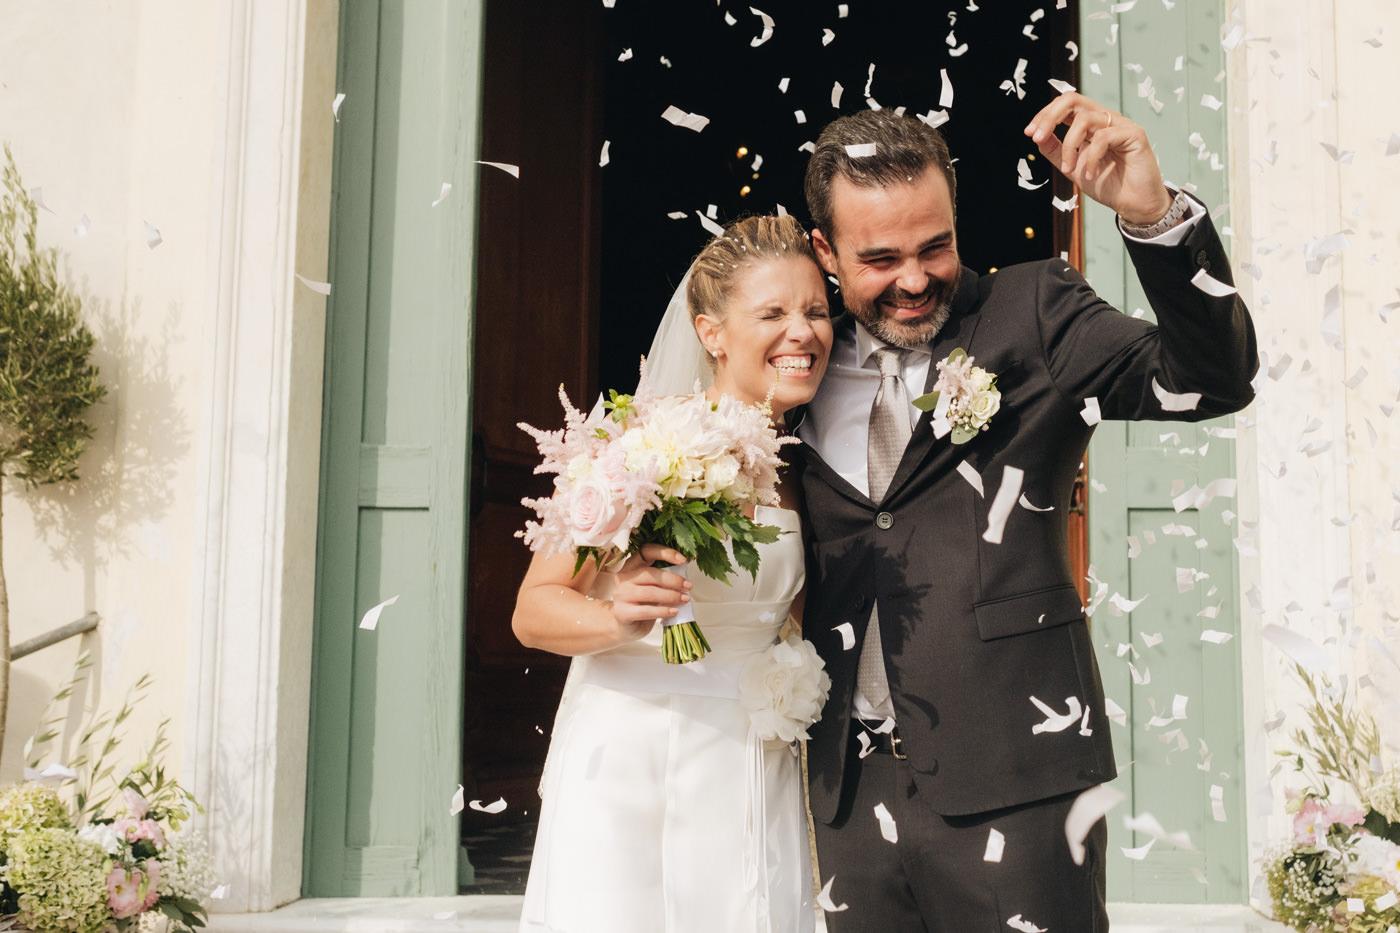 matrimoni_all_italiana_fotografo_matrimonio_cinque_terre-29.jpg